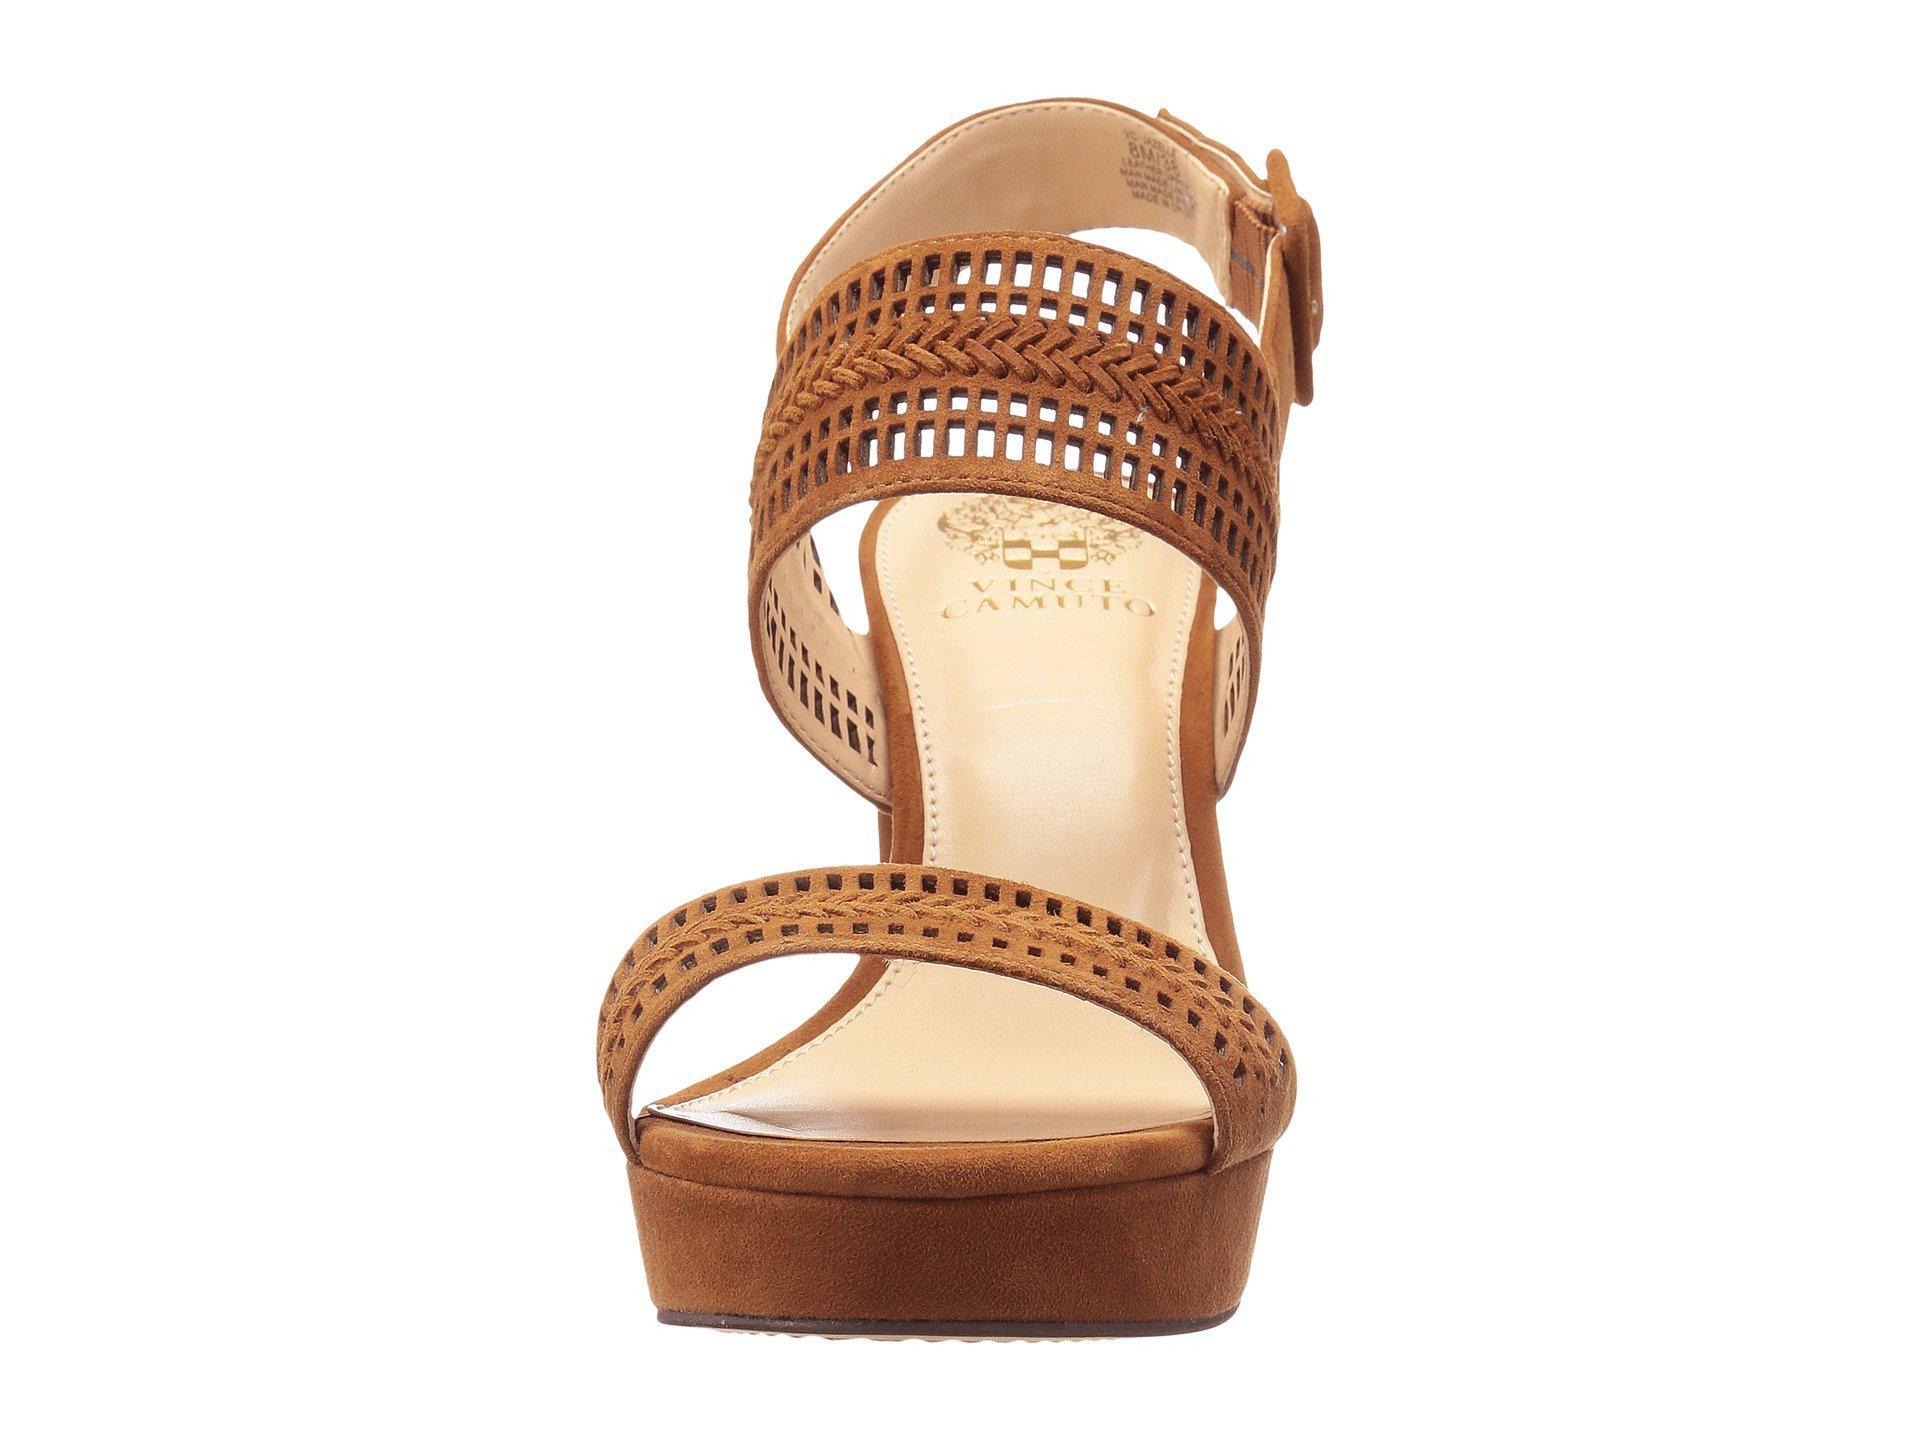 25ecfeaec1a Vince Camuto - Brown Jazelle Suede Cutout Detail Slingback Block Heel Dress  Sandals - Lyst. View fullscreen